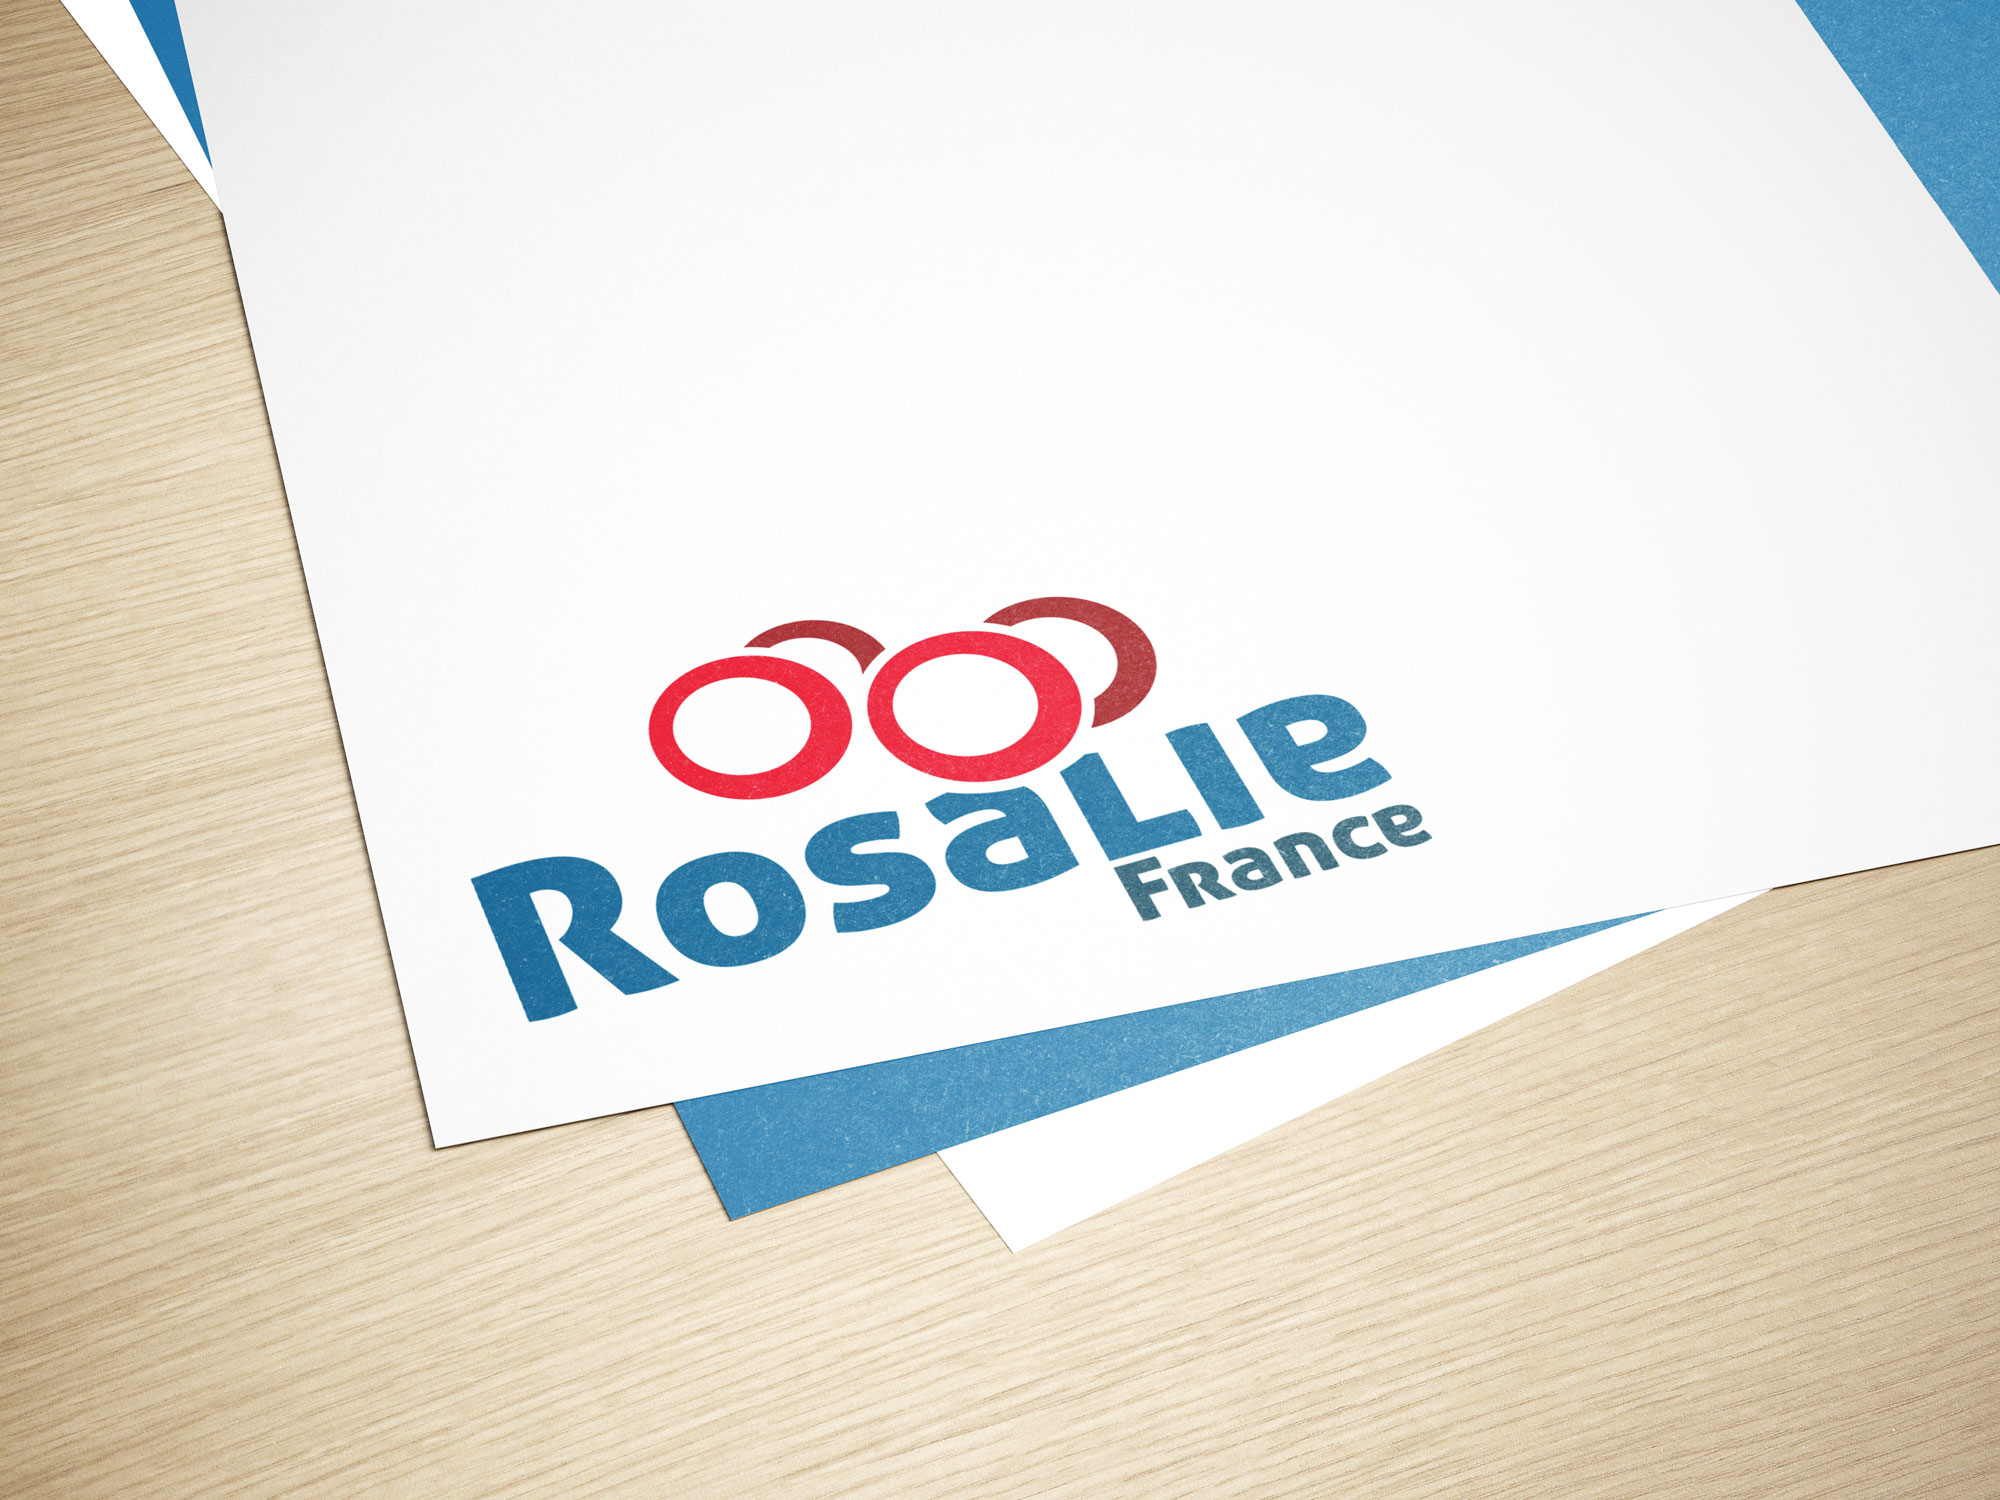 logotype Rosalie France